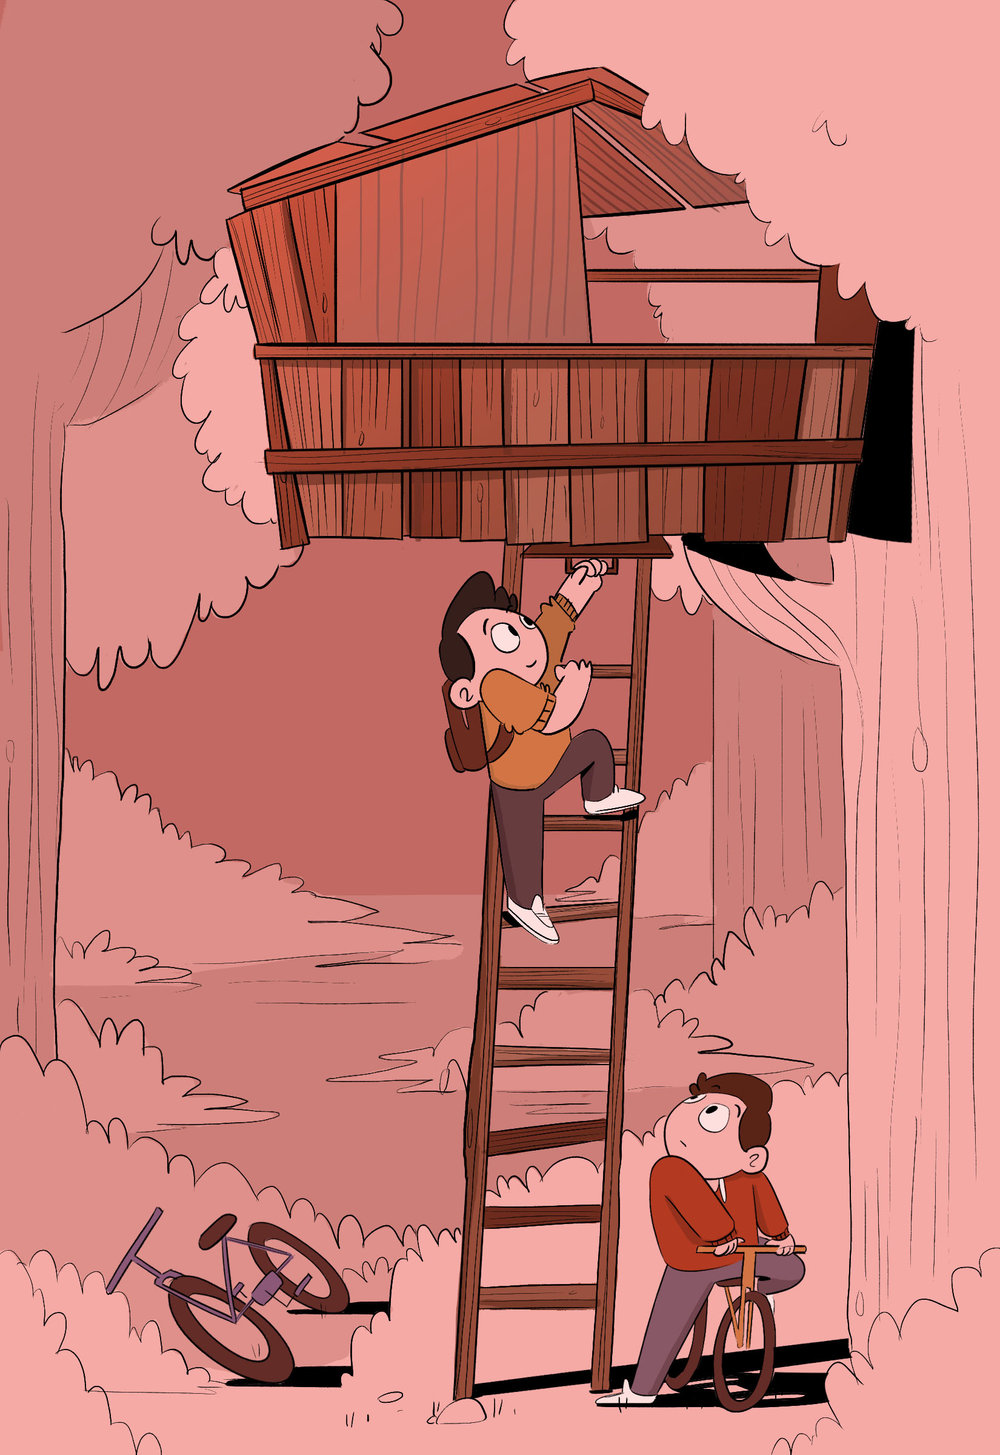 ChristineLe_VD_0002_1st illustration.jpg